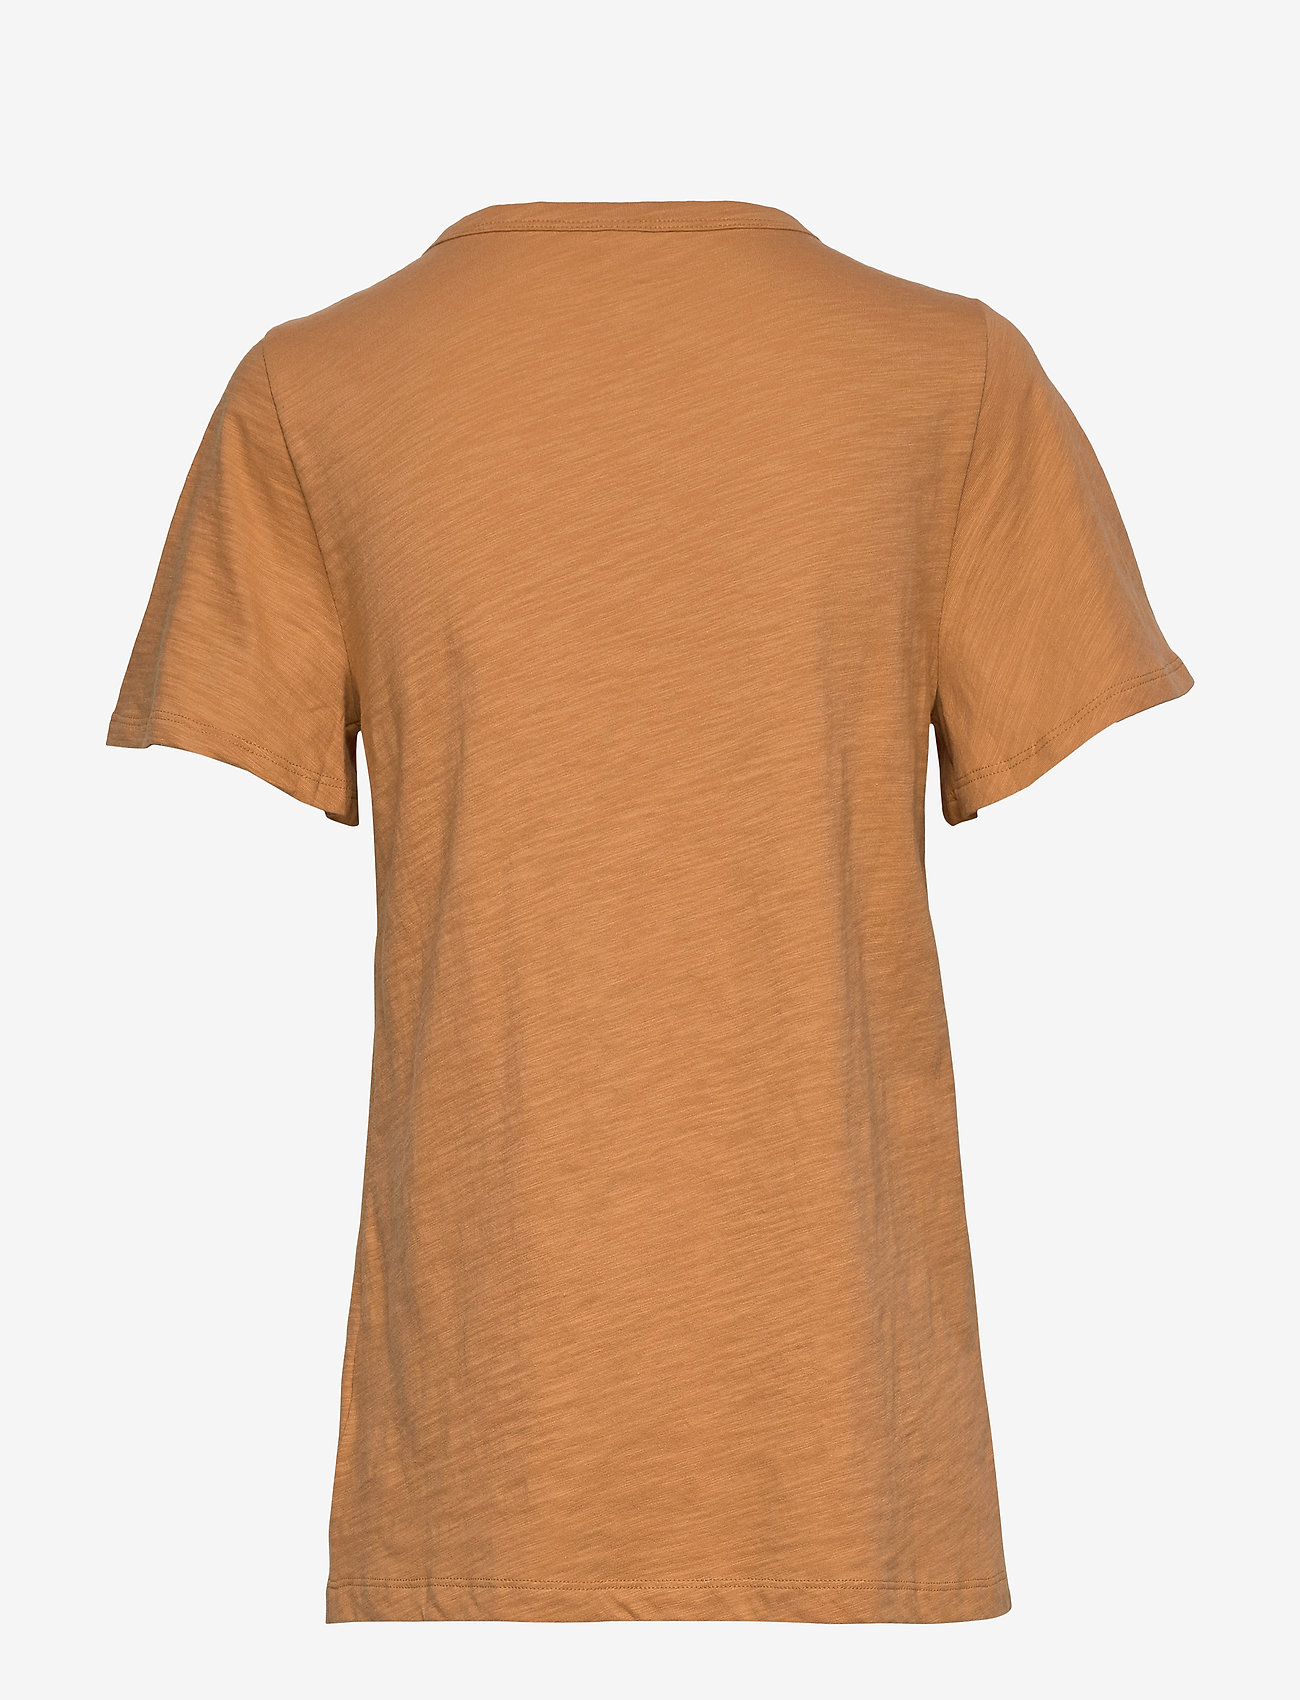 Slub Flutter Sleeve T-shirt (Tumeric 374) - GAP Srgy0p